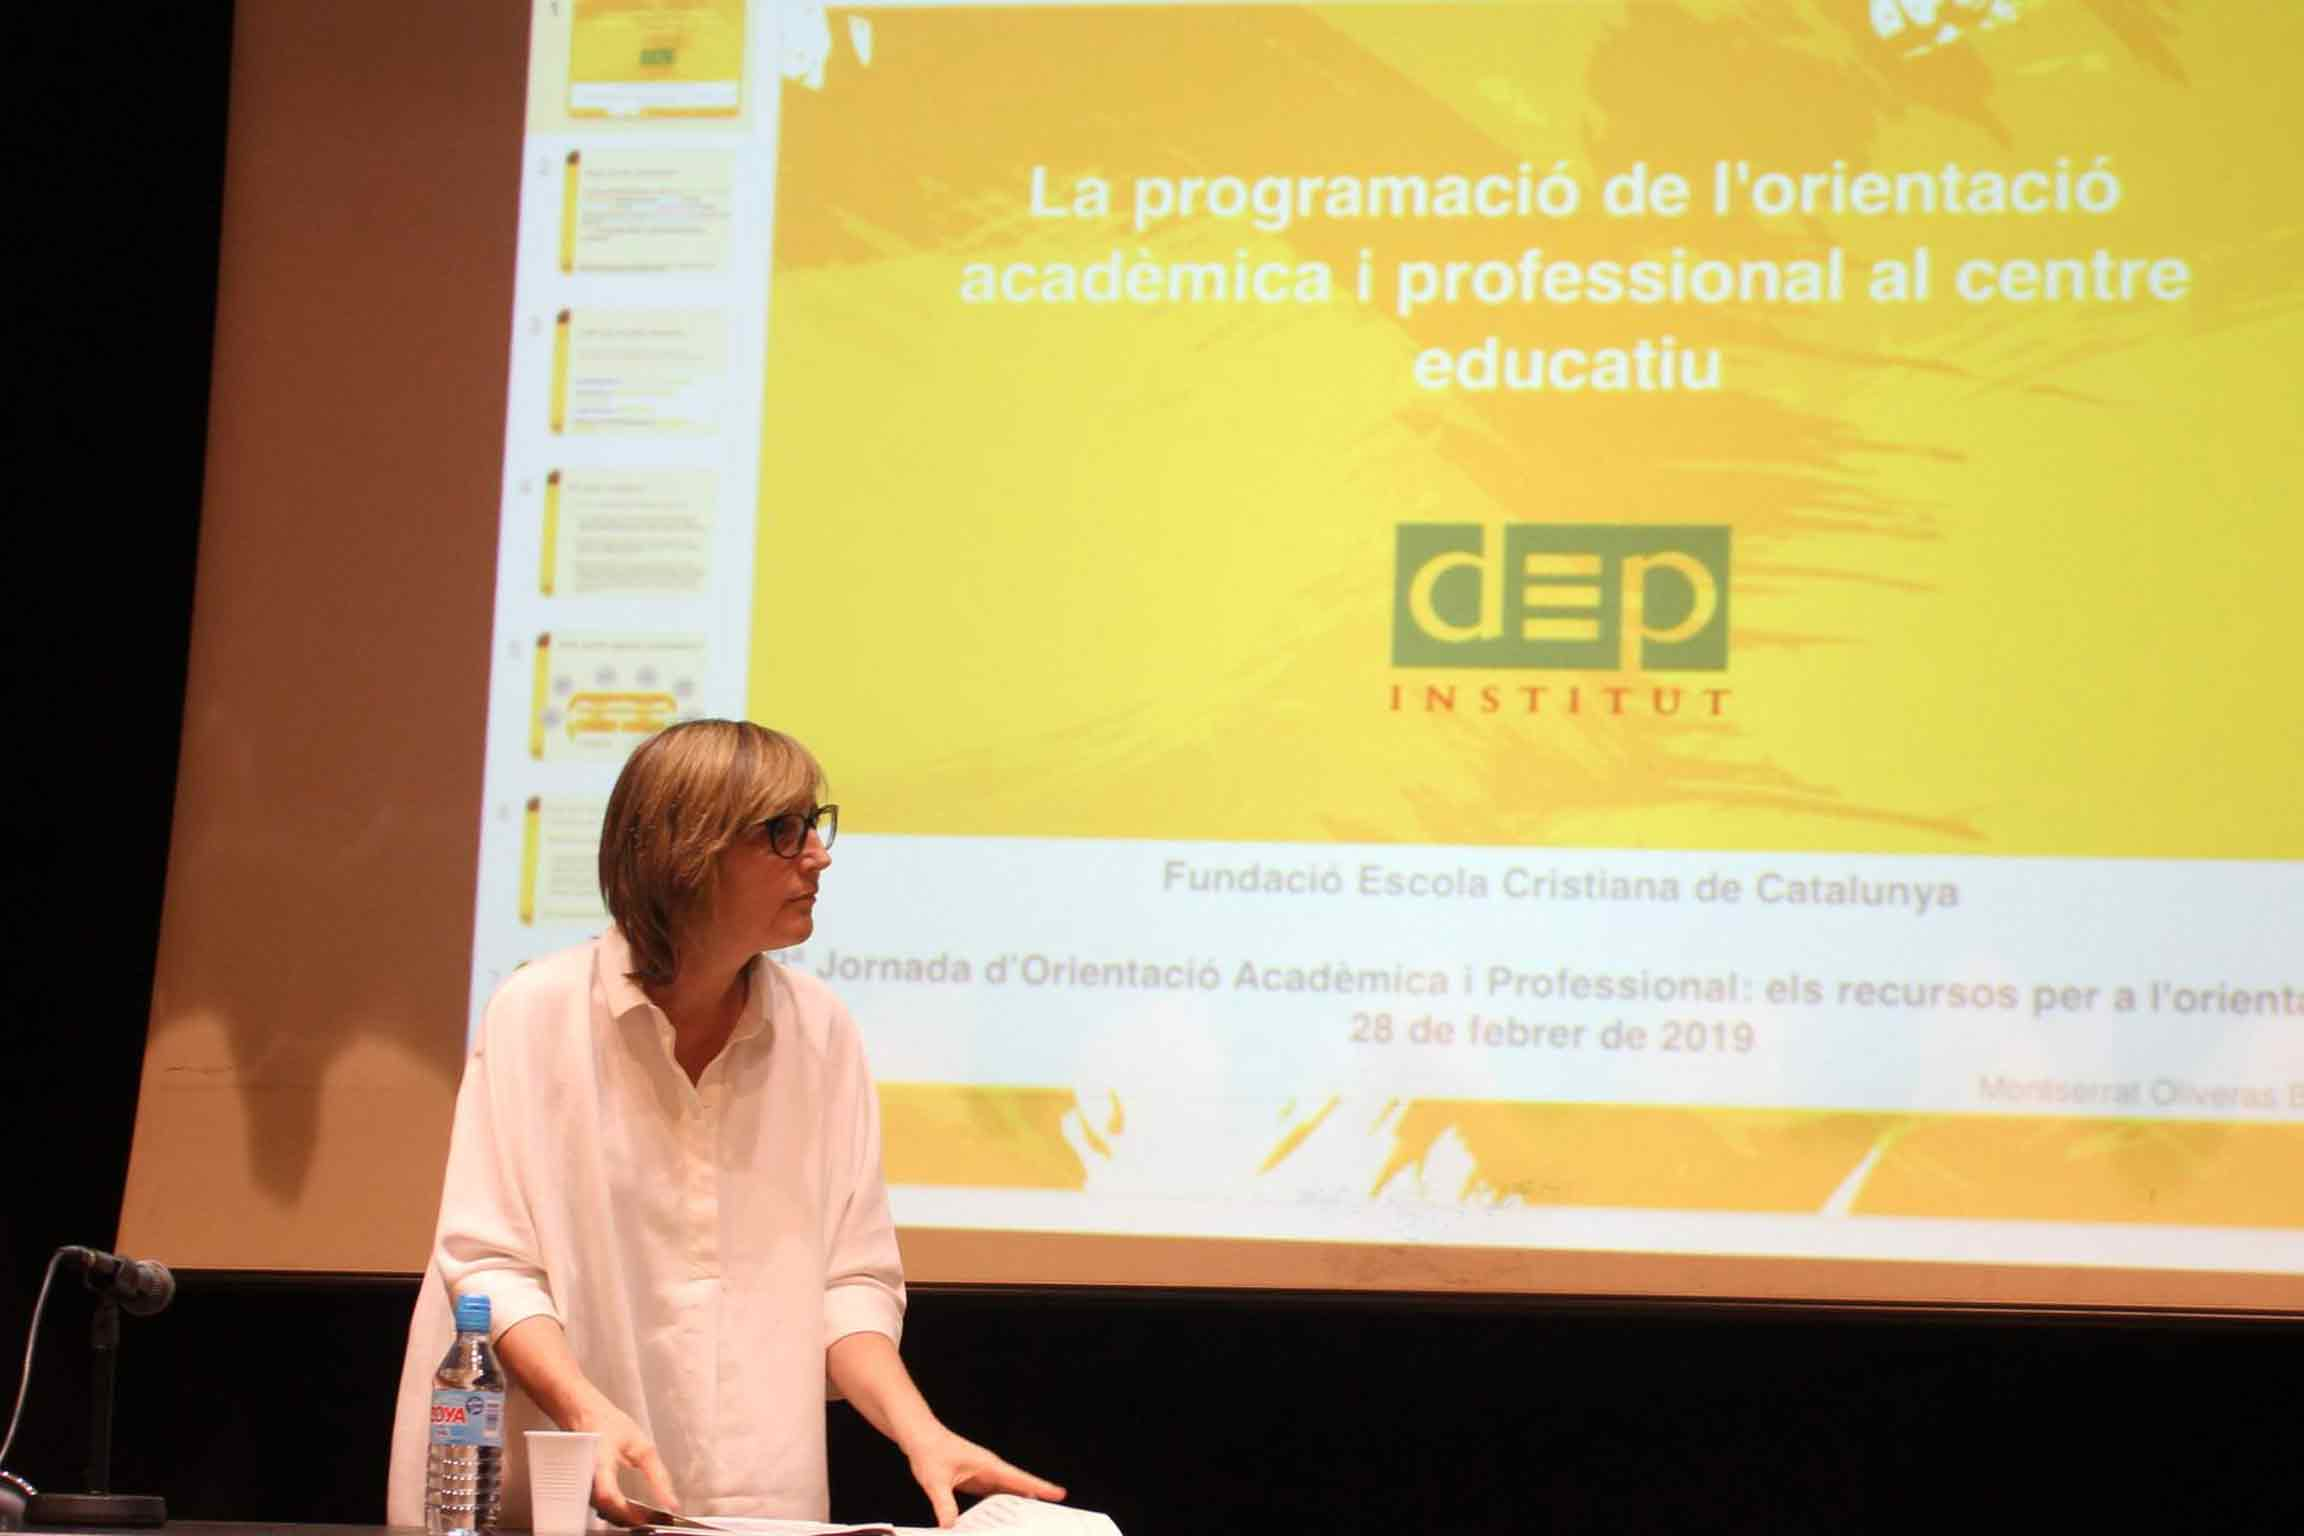 Montse Oliveras Educaweb